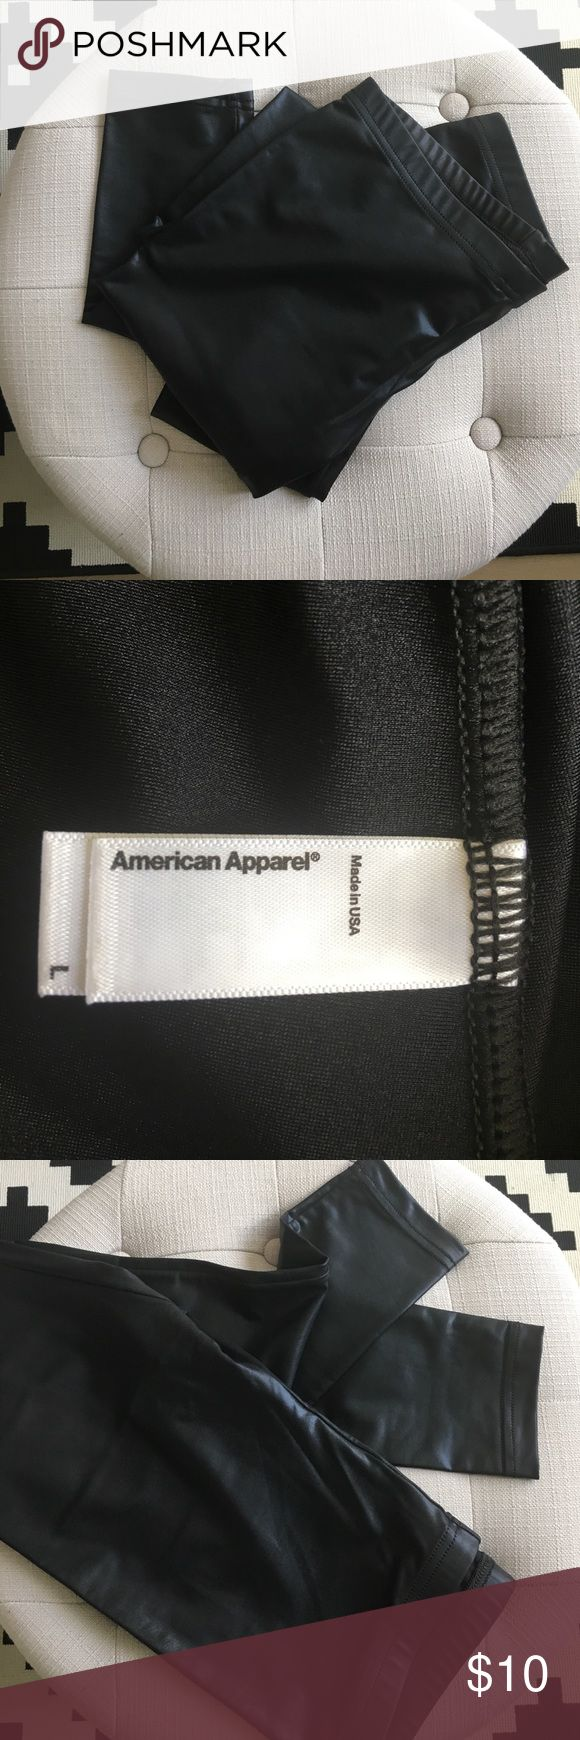 American Apparel faux leather leggings Super cool faux leather leggings from American Apparel. American Apparel Pants Leggings